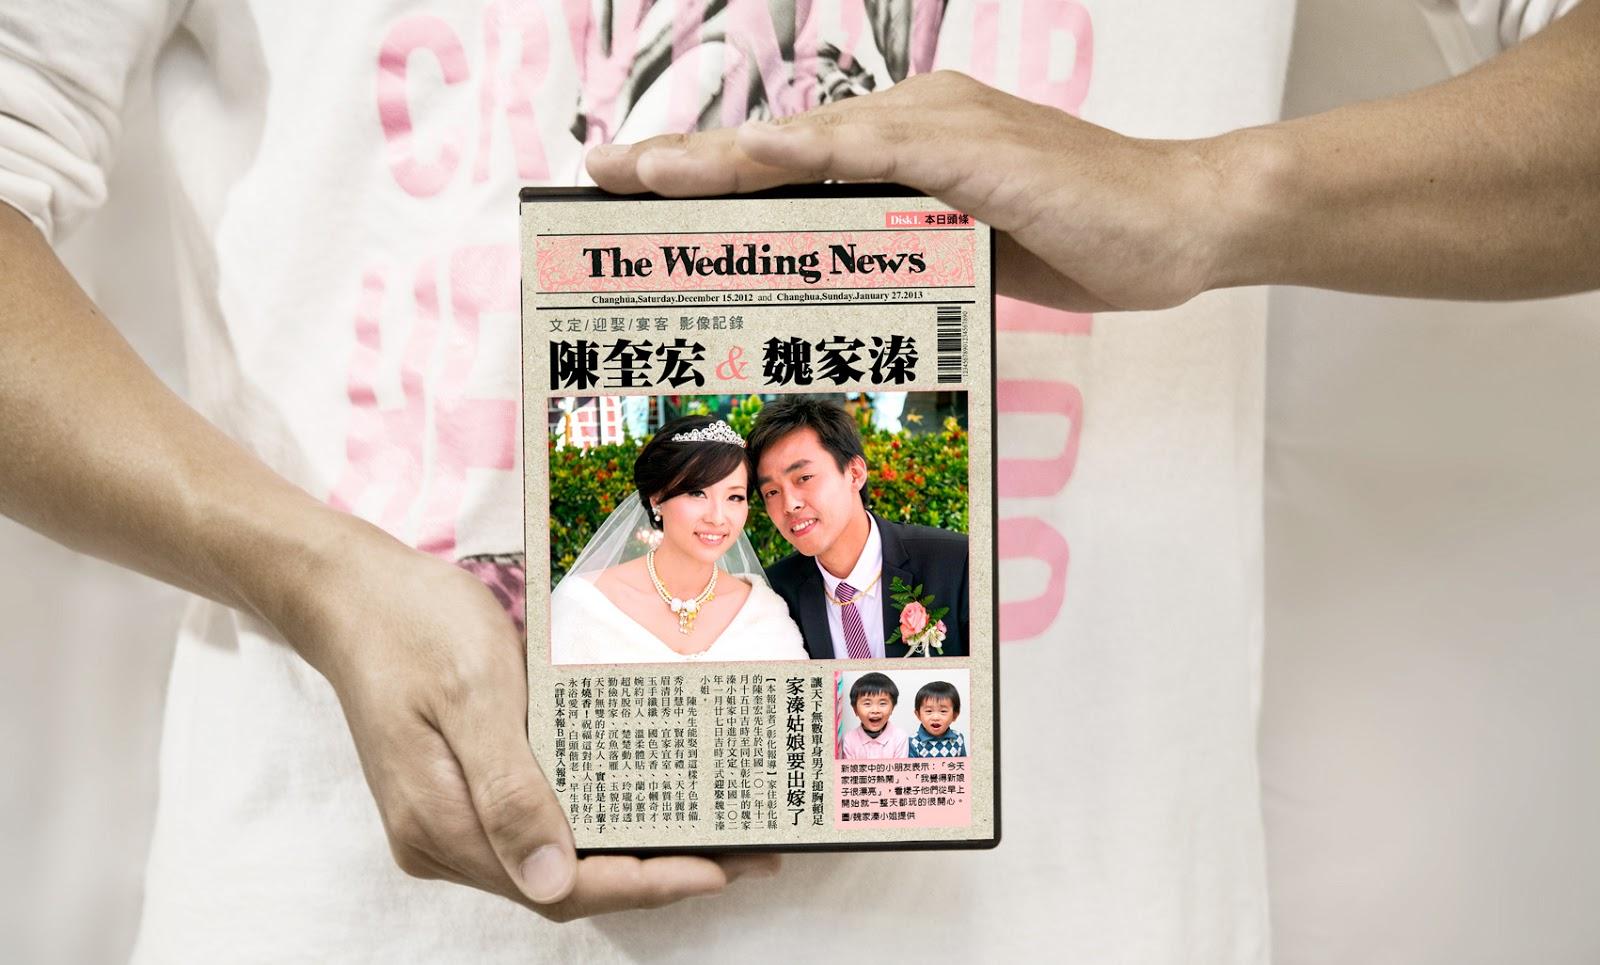 SHOWCASE作品展示 | 奎宏×家溱婚攝DVD封面設計 by MUMULab.com